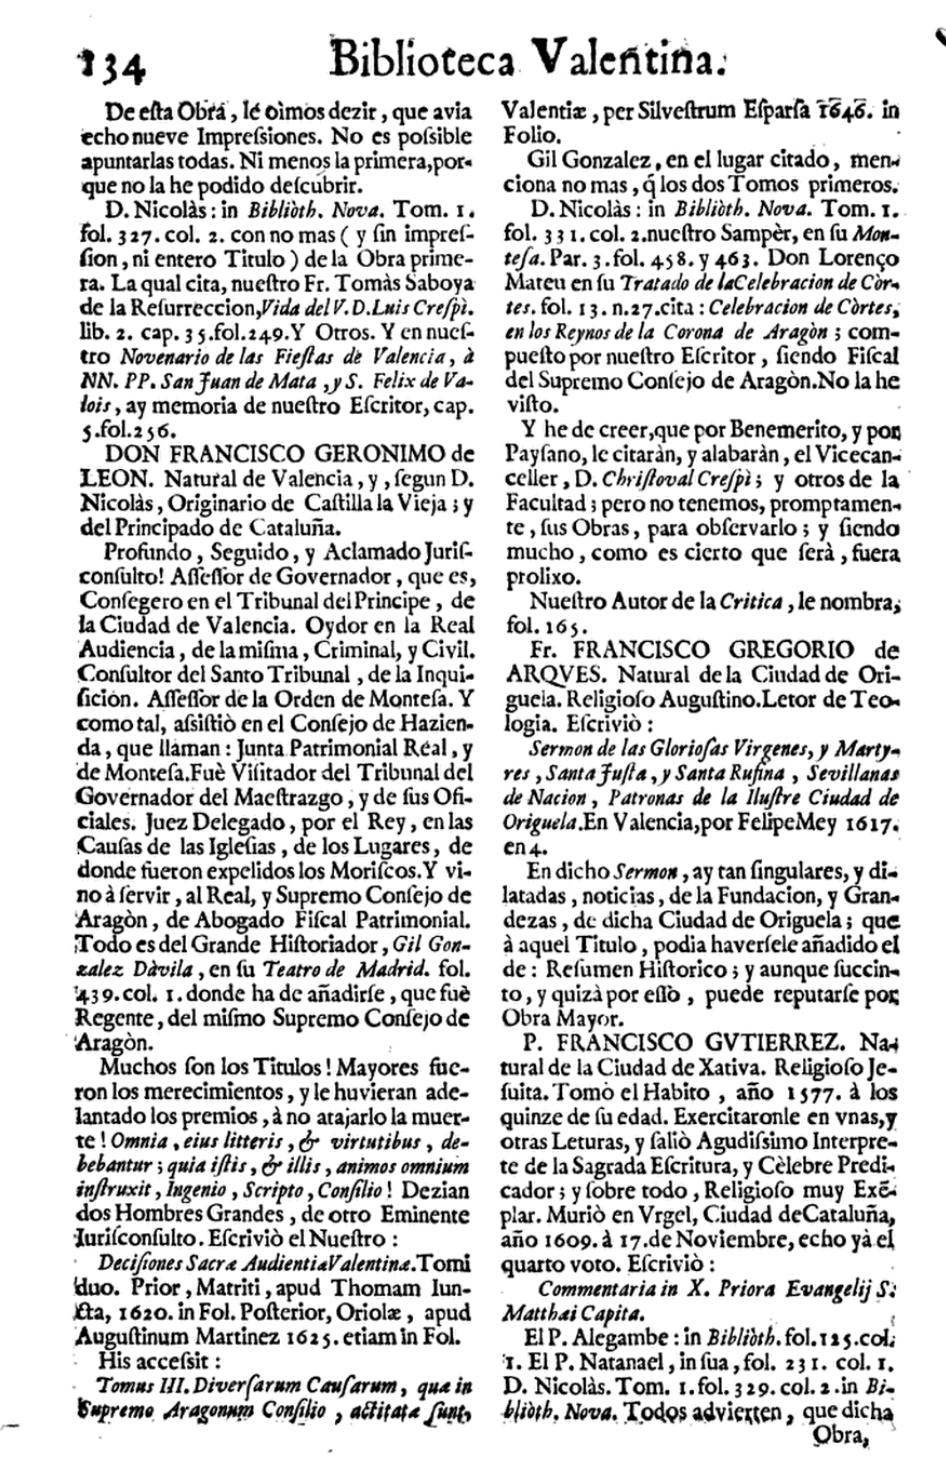 Biografia Bilioteca valenciana Franciso Jerónimo